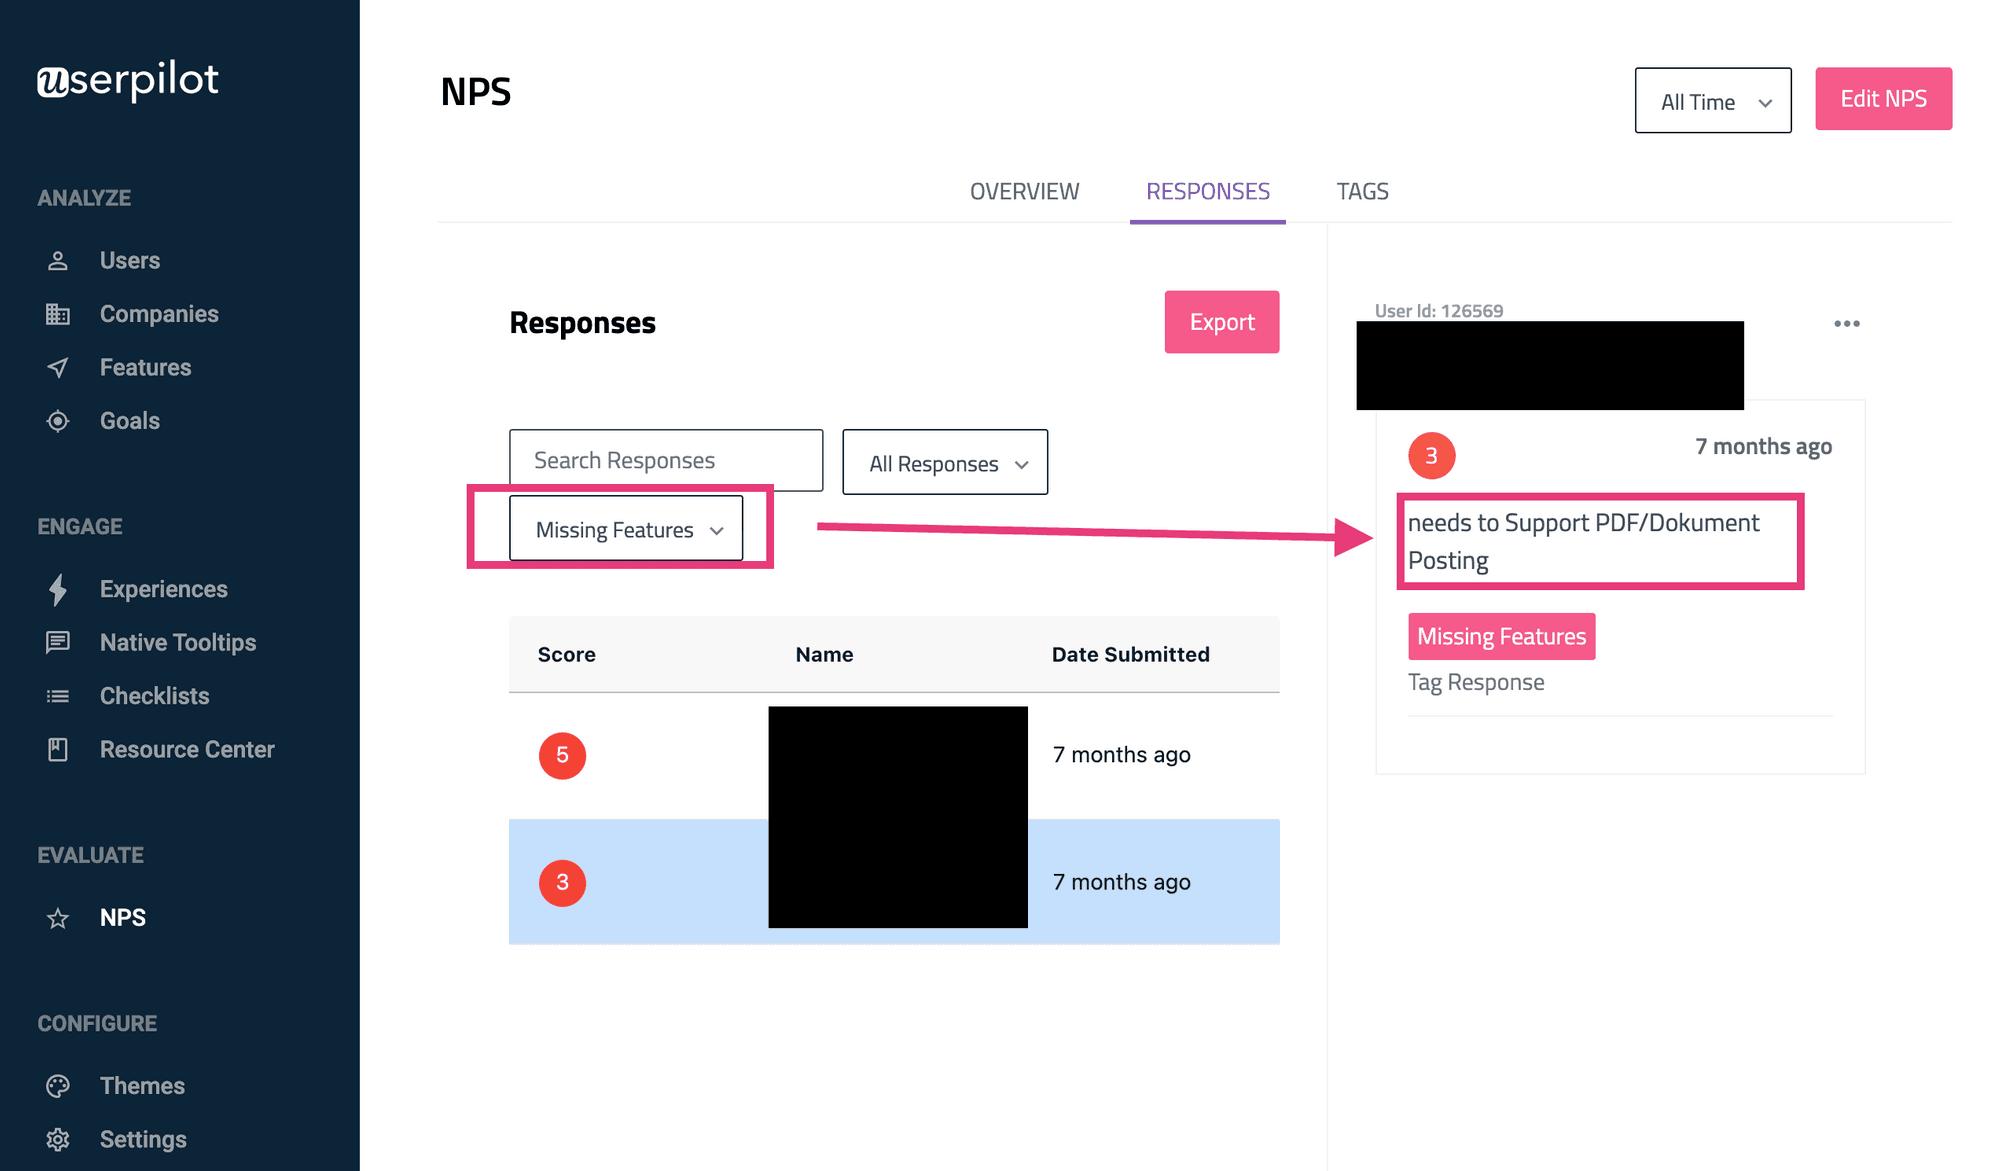 net promoter score (nps) missing features segmentation